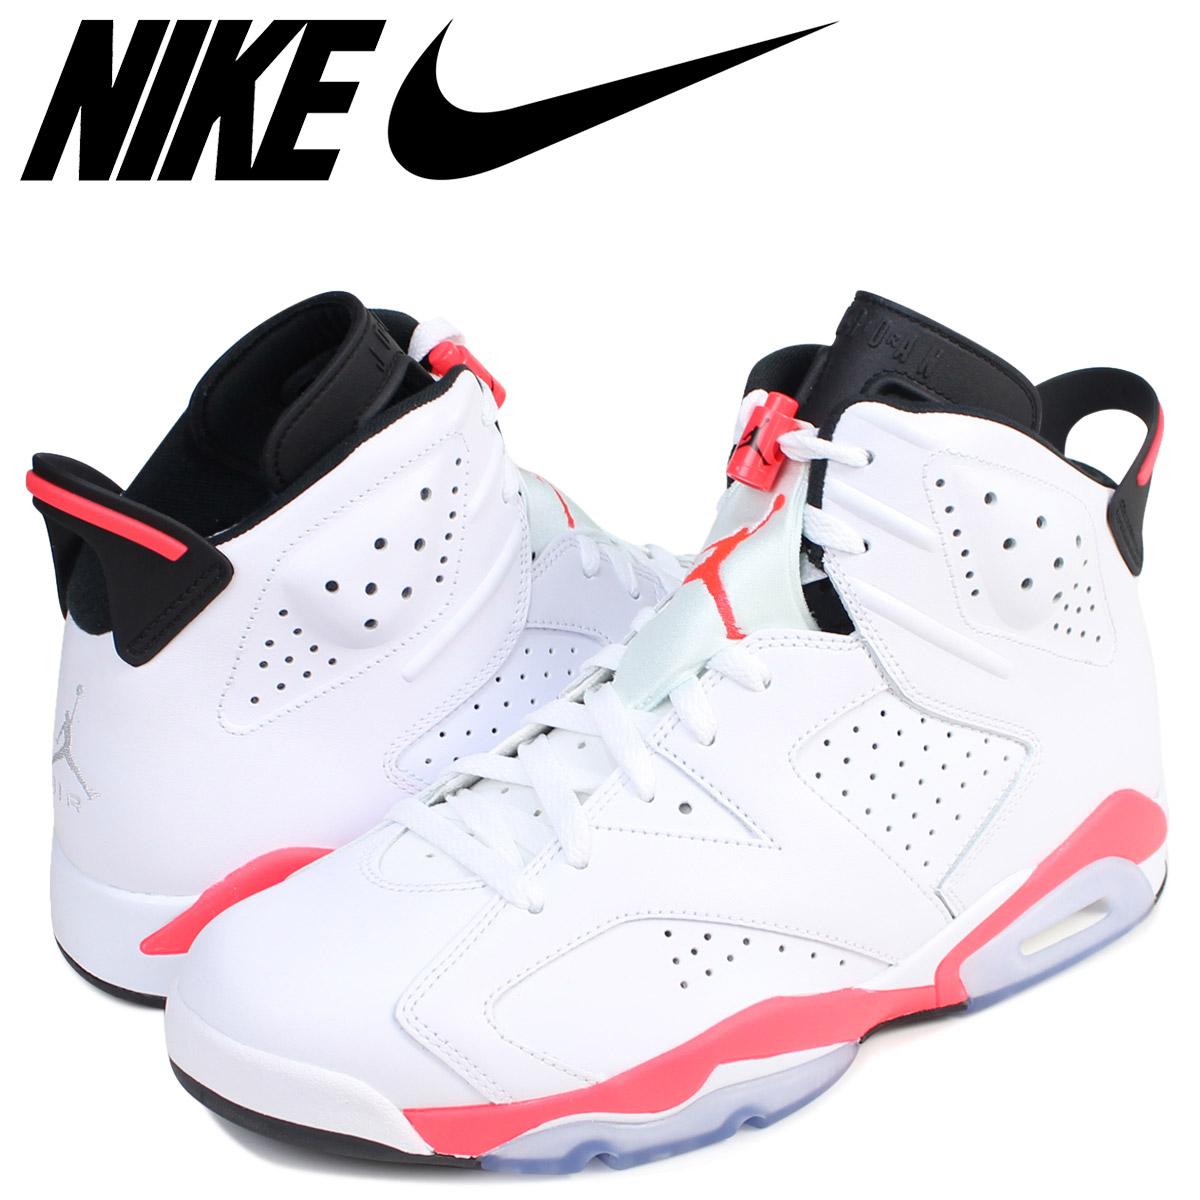 reputable site e6e52 1a58a NIKE Nike Air Jordan 6 nostalgic sneakers AIR JORDAN 6 RETRO INFRARED men  384,664-123 shoes white white